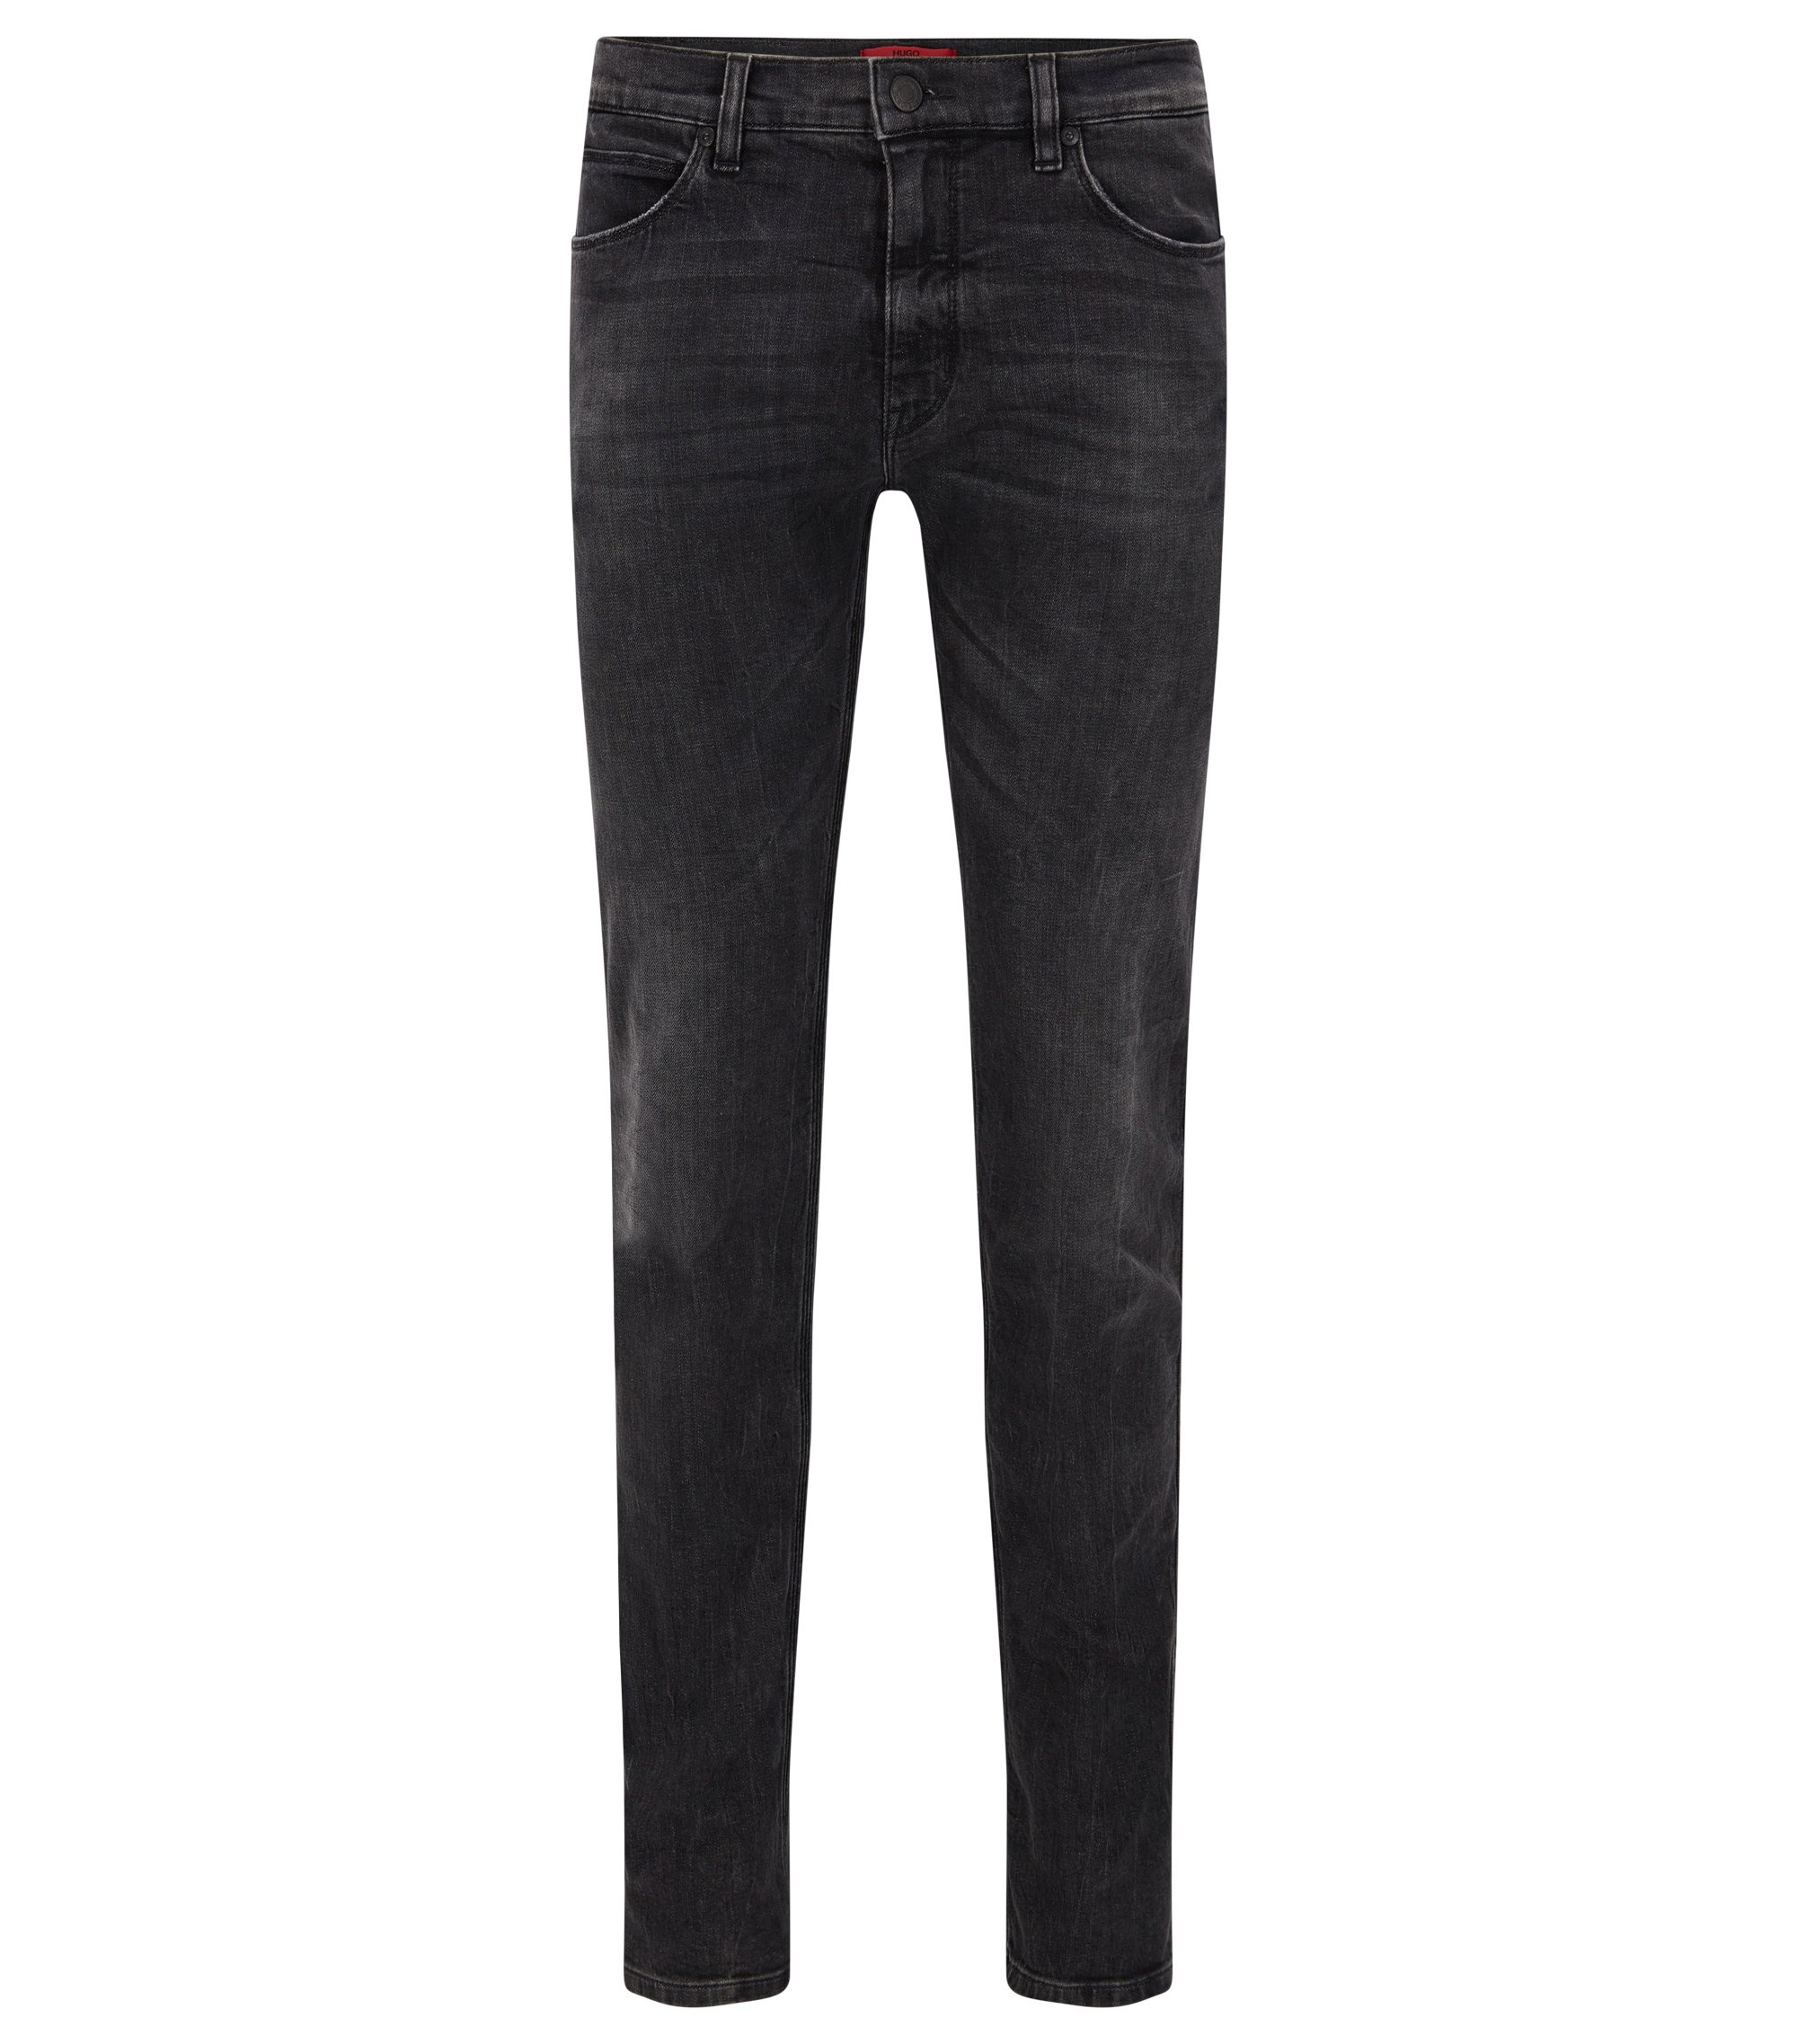 9.5 oz Stretch Cotton Blend Jeans, Slim Fit | Hugo 708, Dark Grey